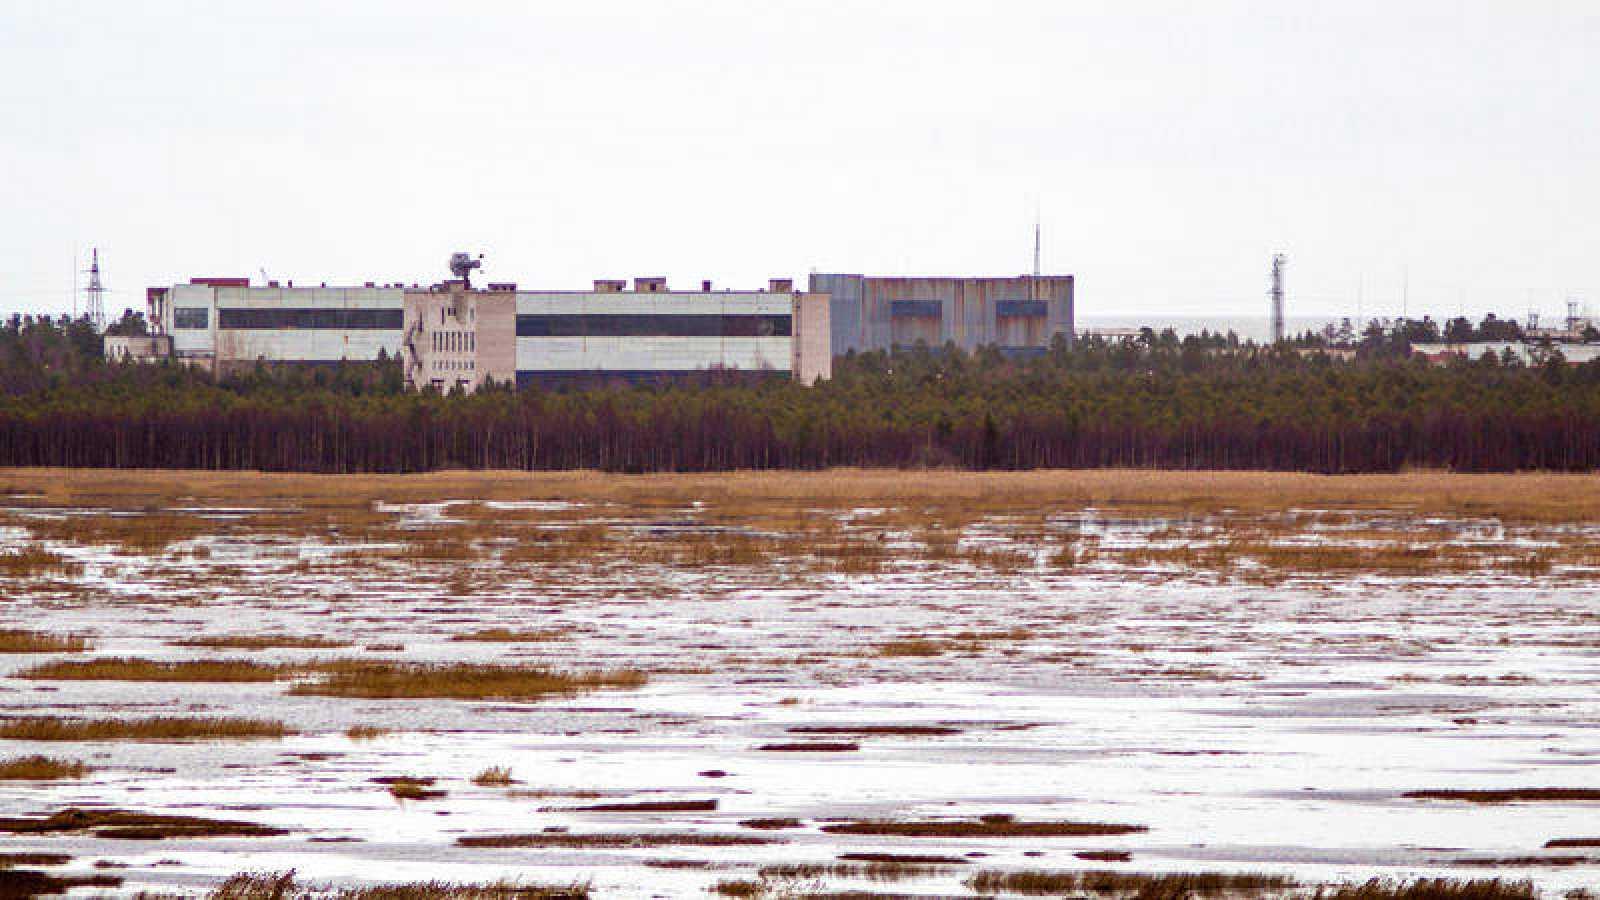 Base militar rusa de Nyonoska en el norte de Rusia